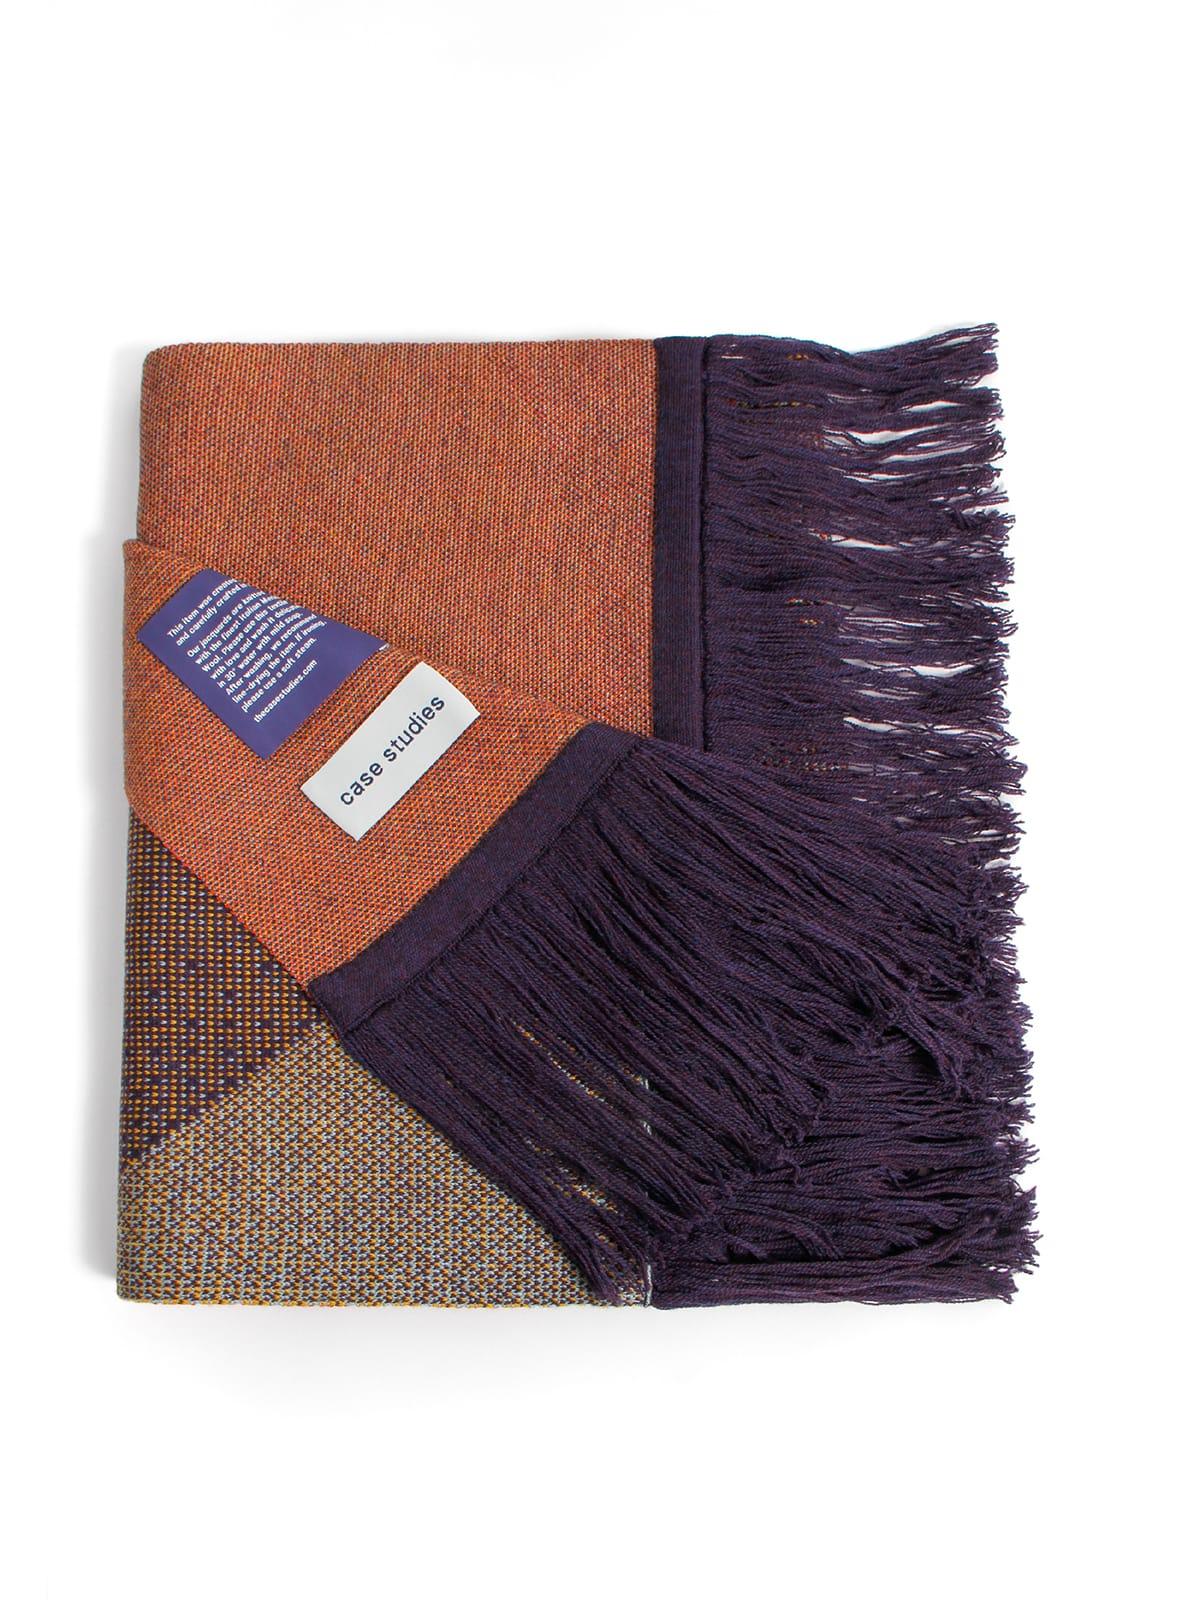 Knitted Scarf Musselshell - Merino Wool folded